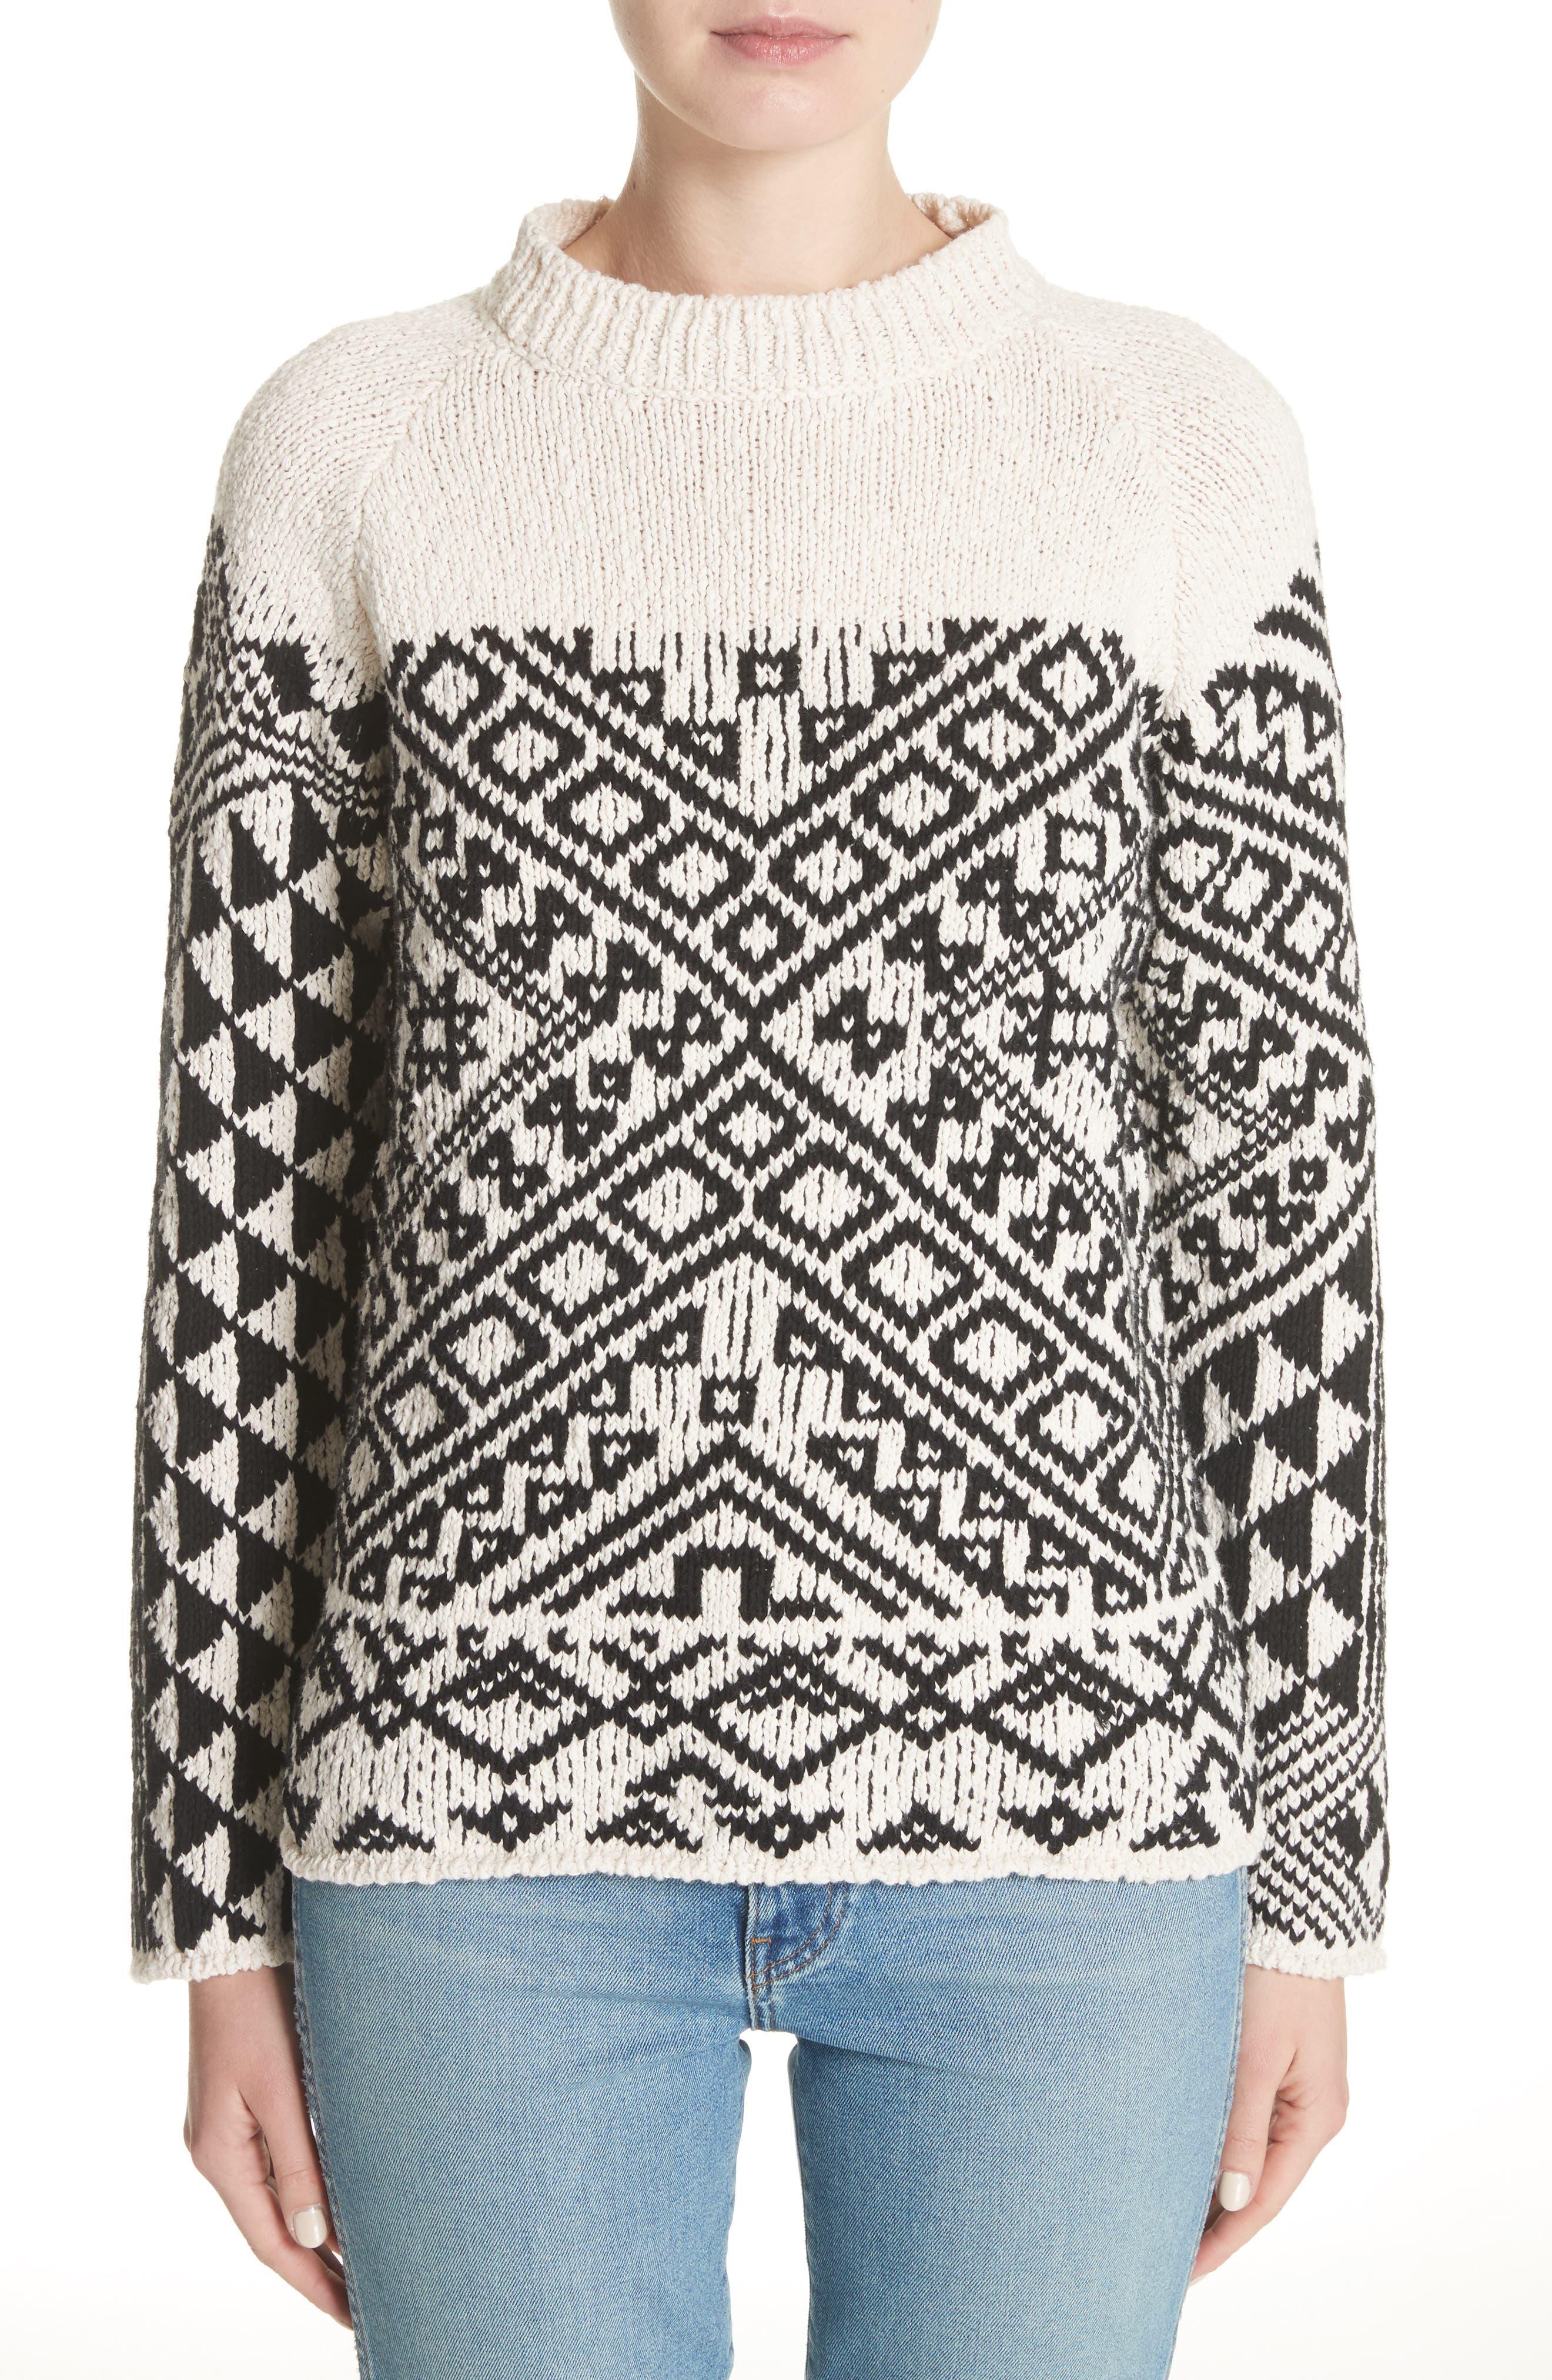 Rhia Jacquard Sweater,                             Main thumbnail 1, color,